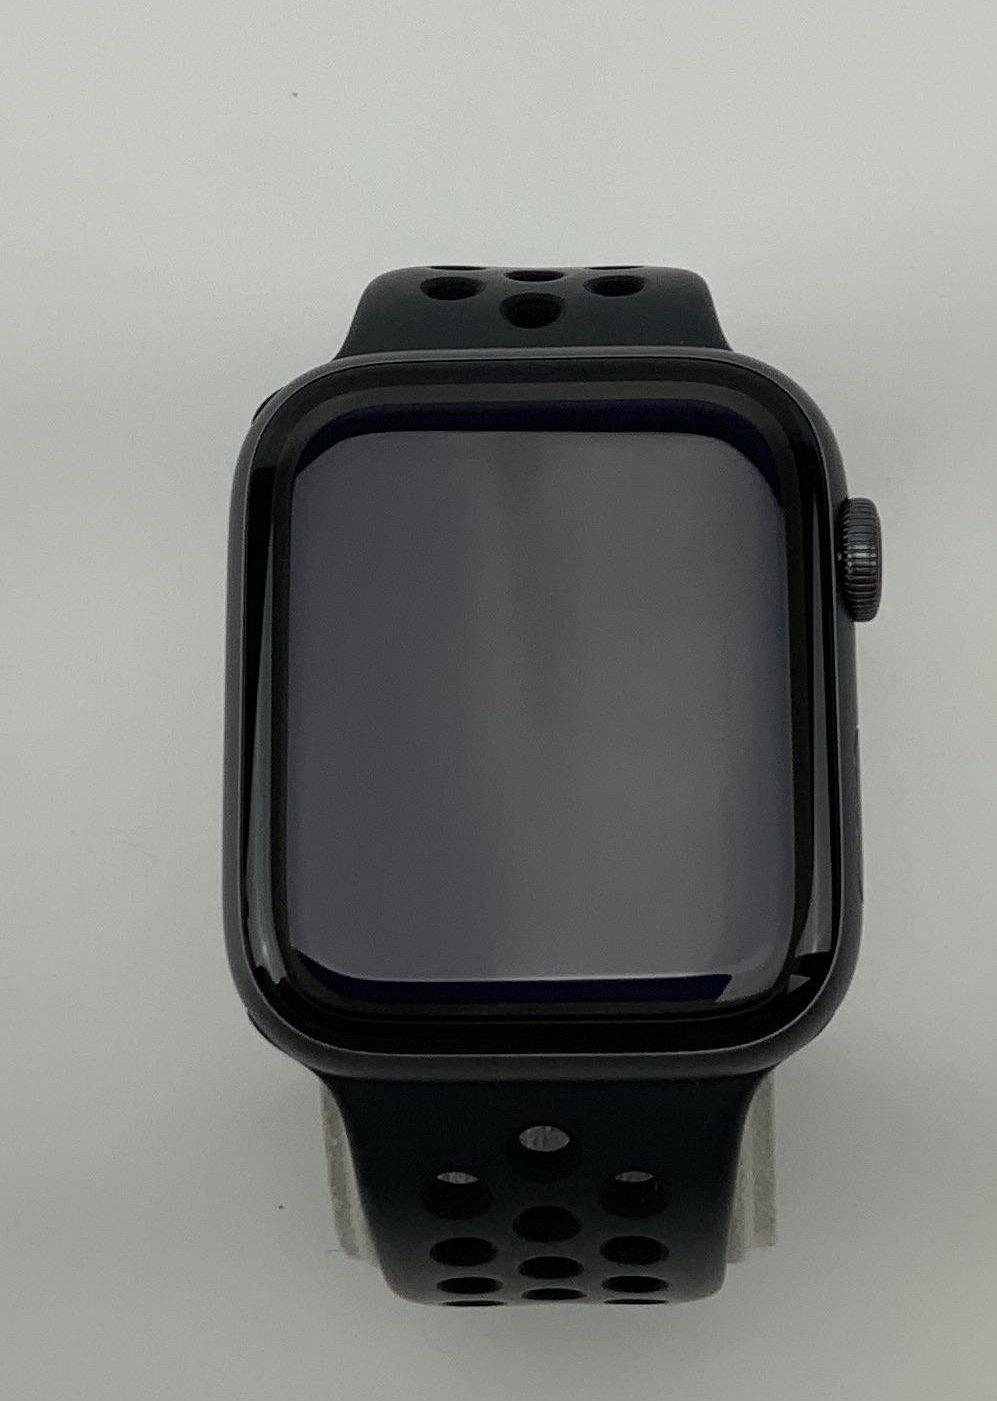 Watch Series 4 Aluminum Cellular (44mm), Space Gray, Black Nike Sport Loop, imagen 2